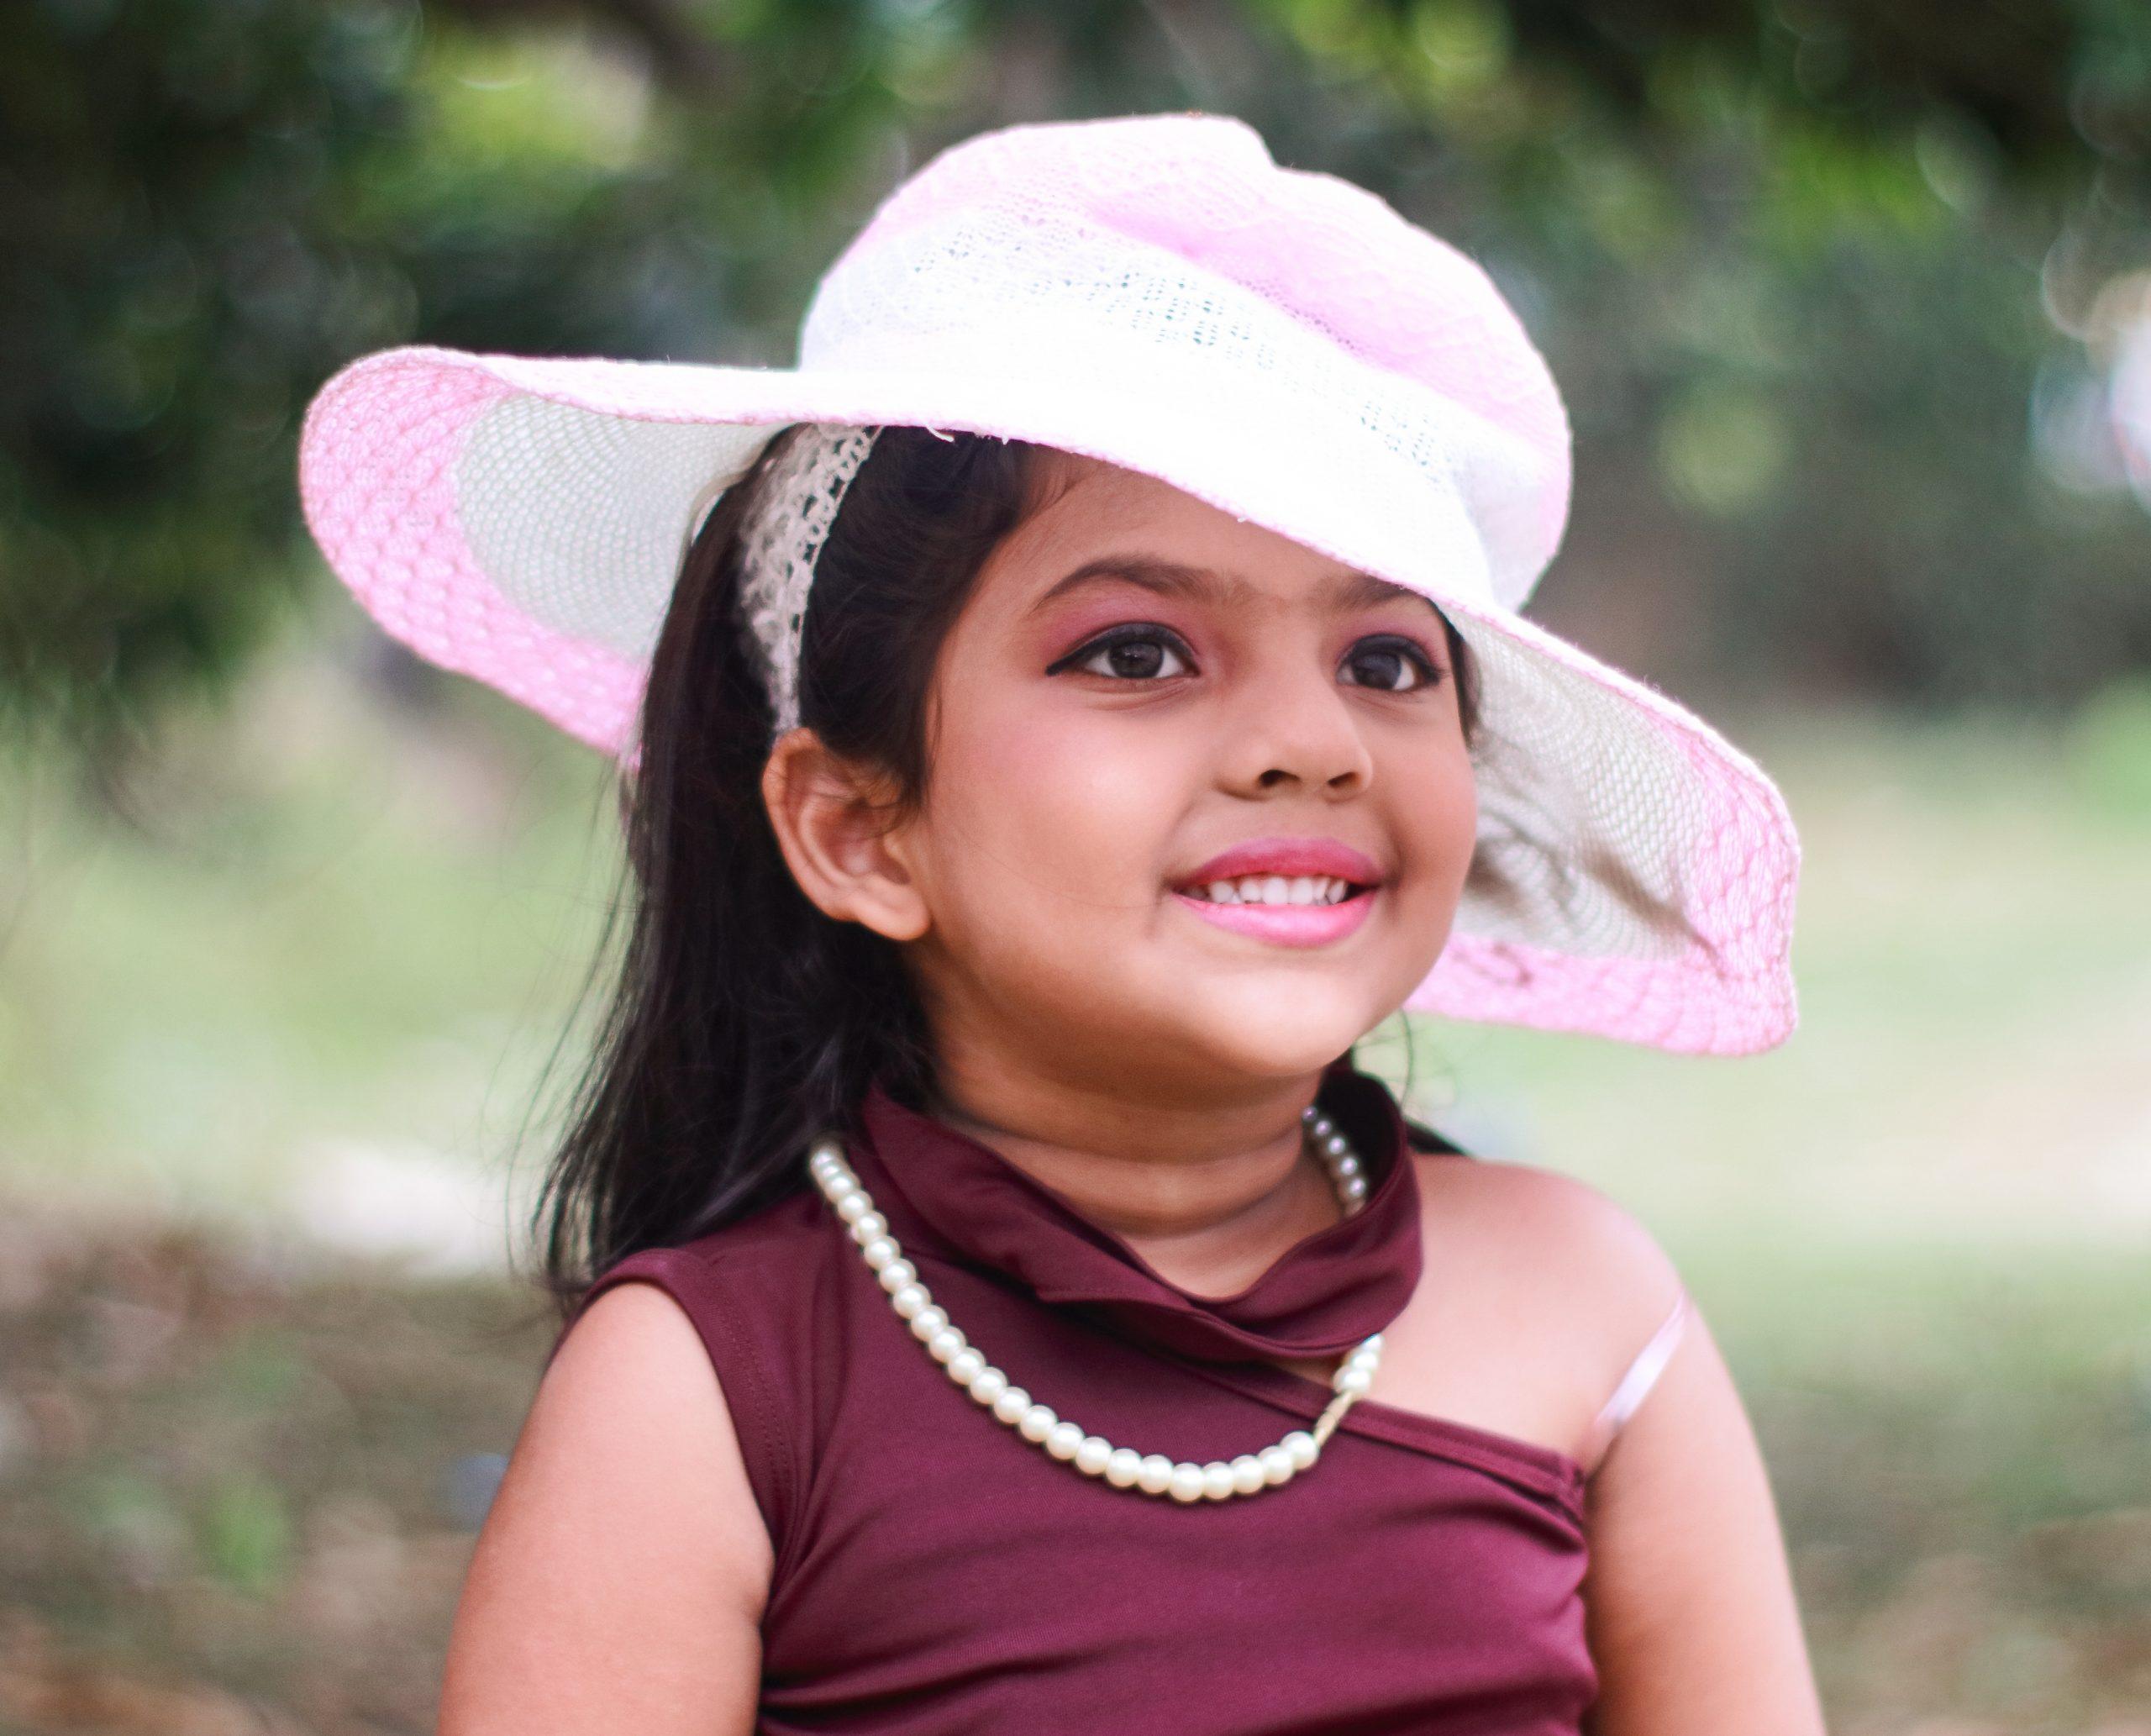 A stylish cute girl